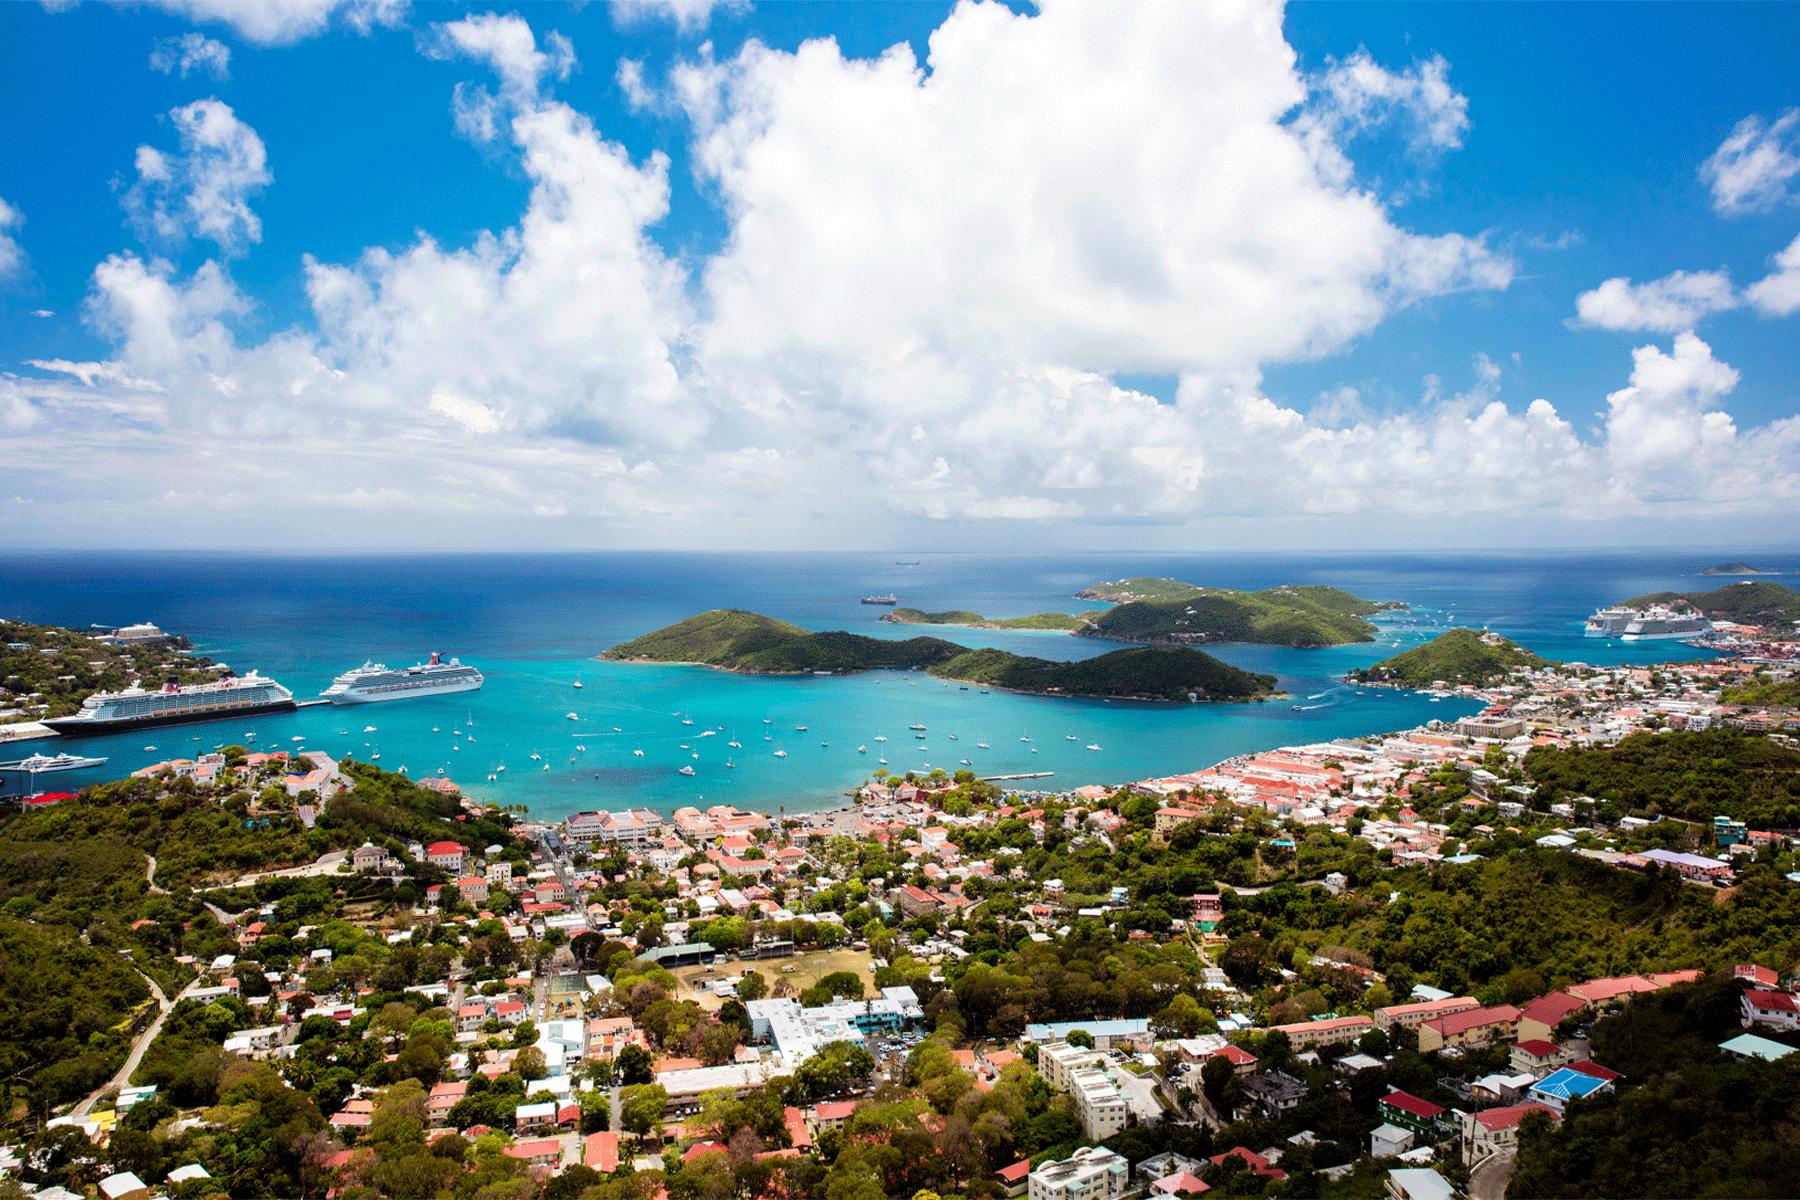 st-thomas-us-virgin-islands-viewpoint-cruise-port